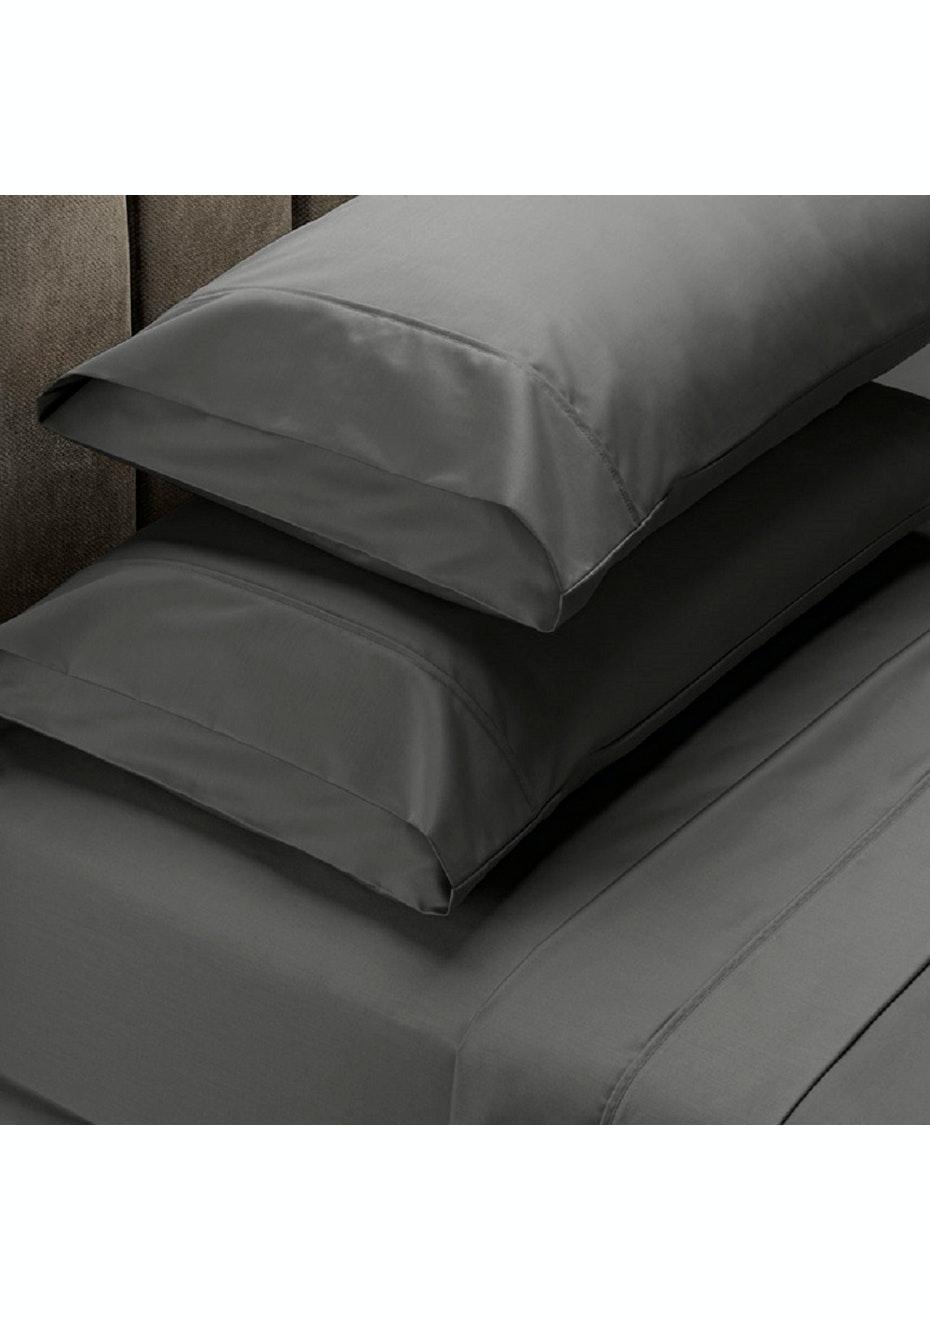 Park Avenue 1000 Thread Count 100% Egyptian Cotton Sheet Sets Queen - Granite